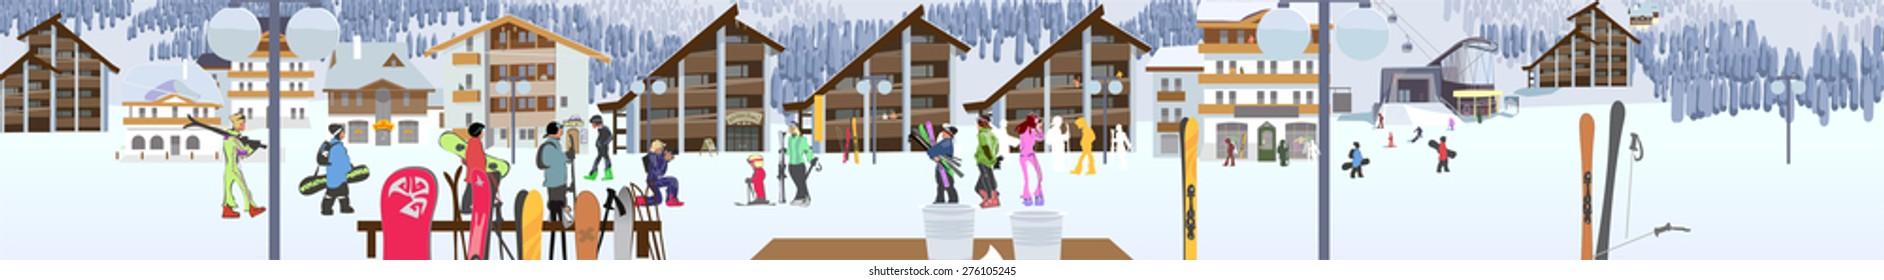 Ski resort, hotel and ski lifts. Vector